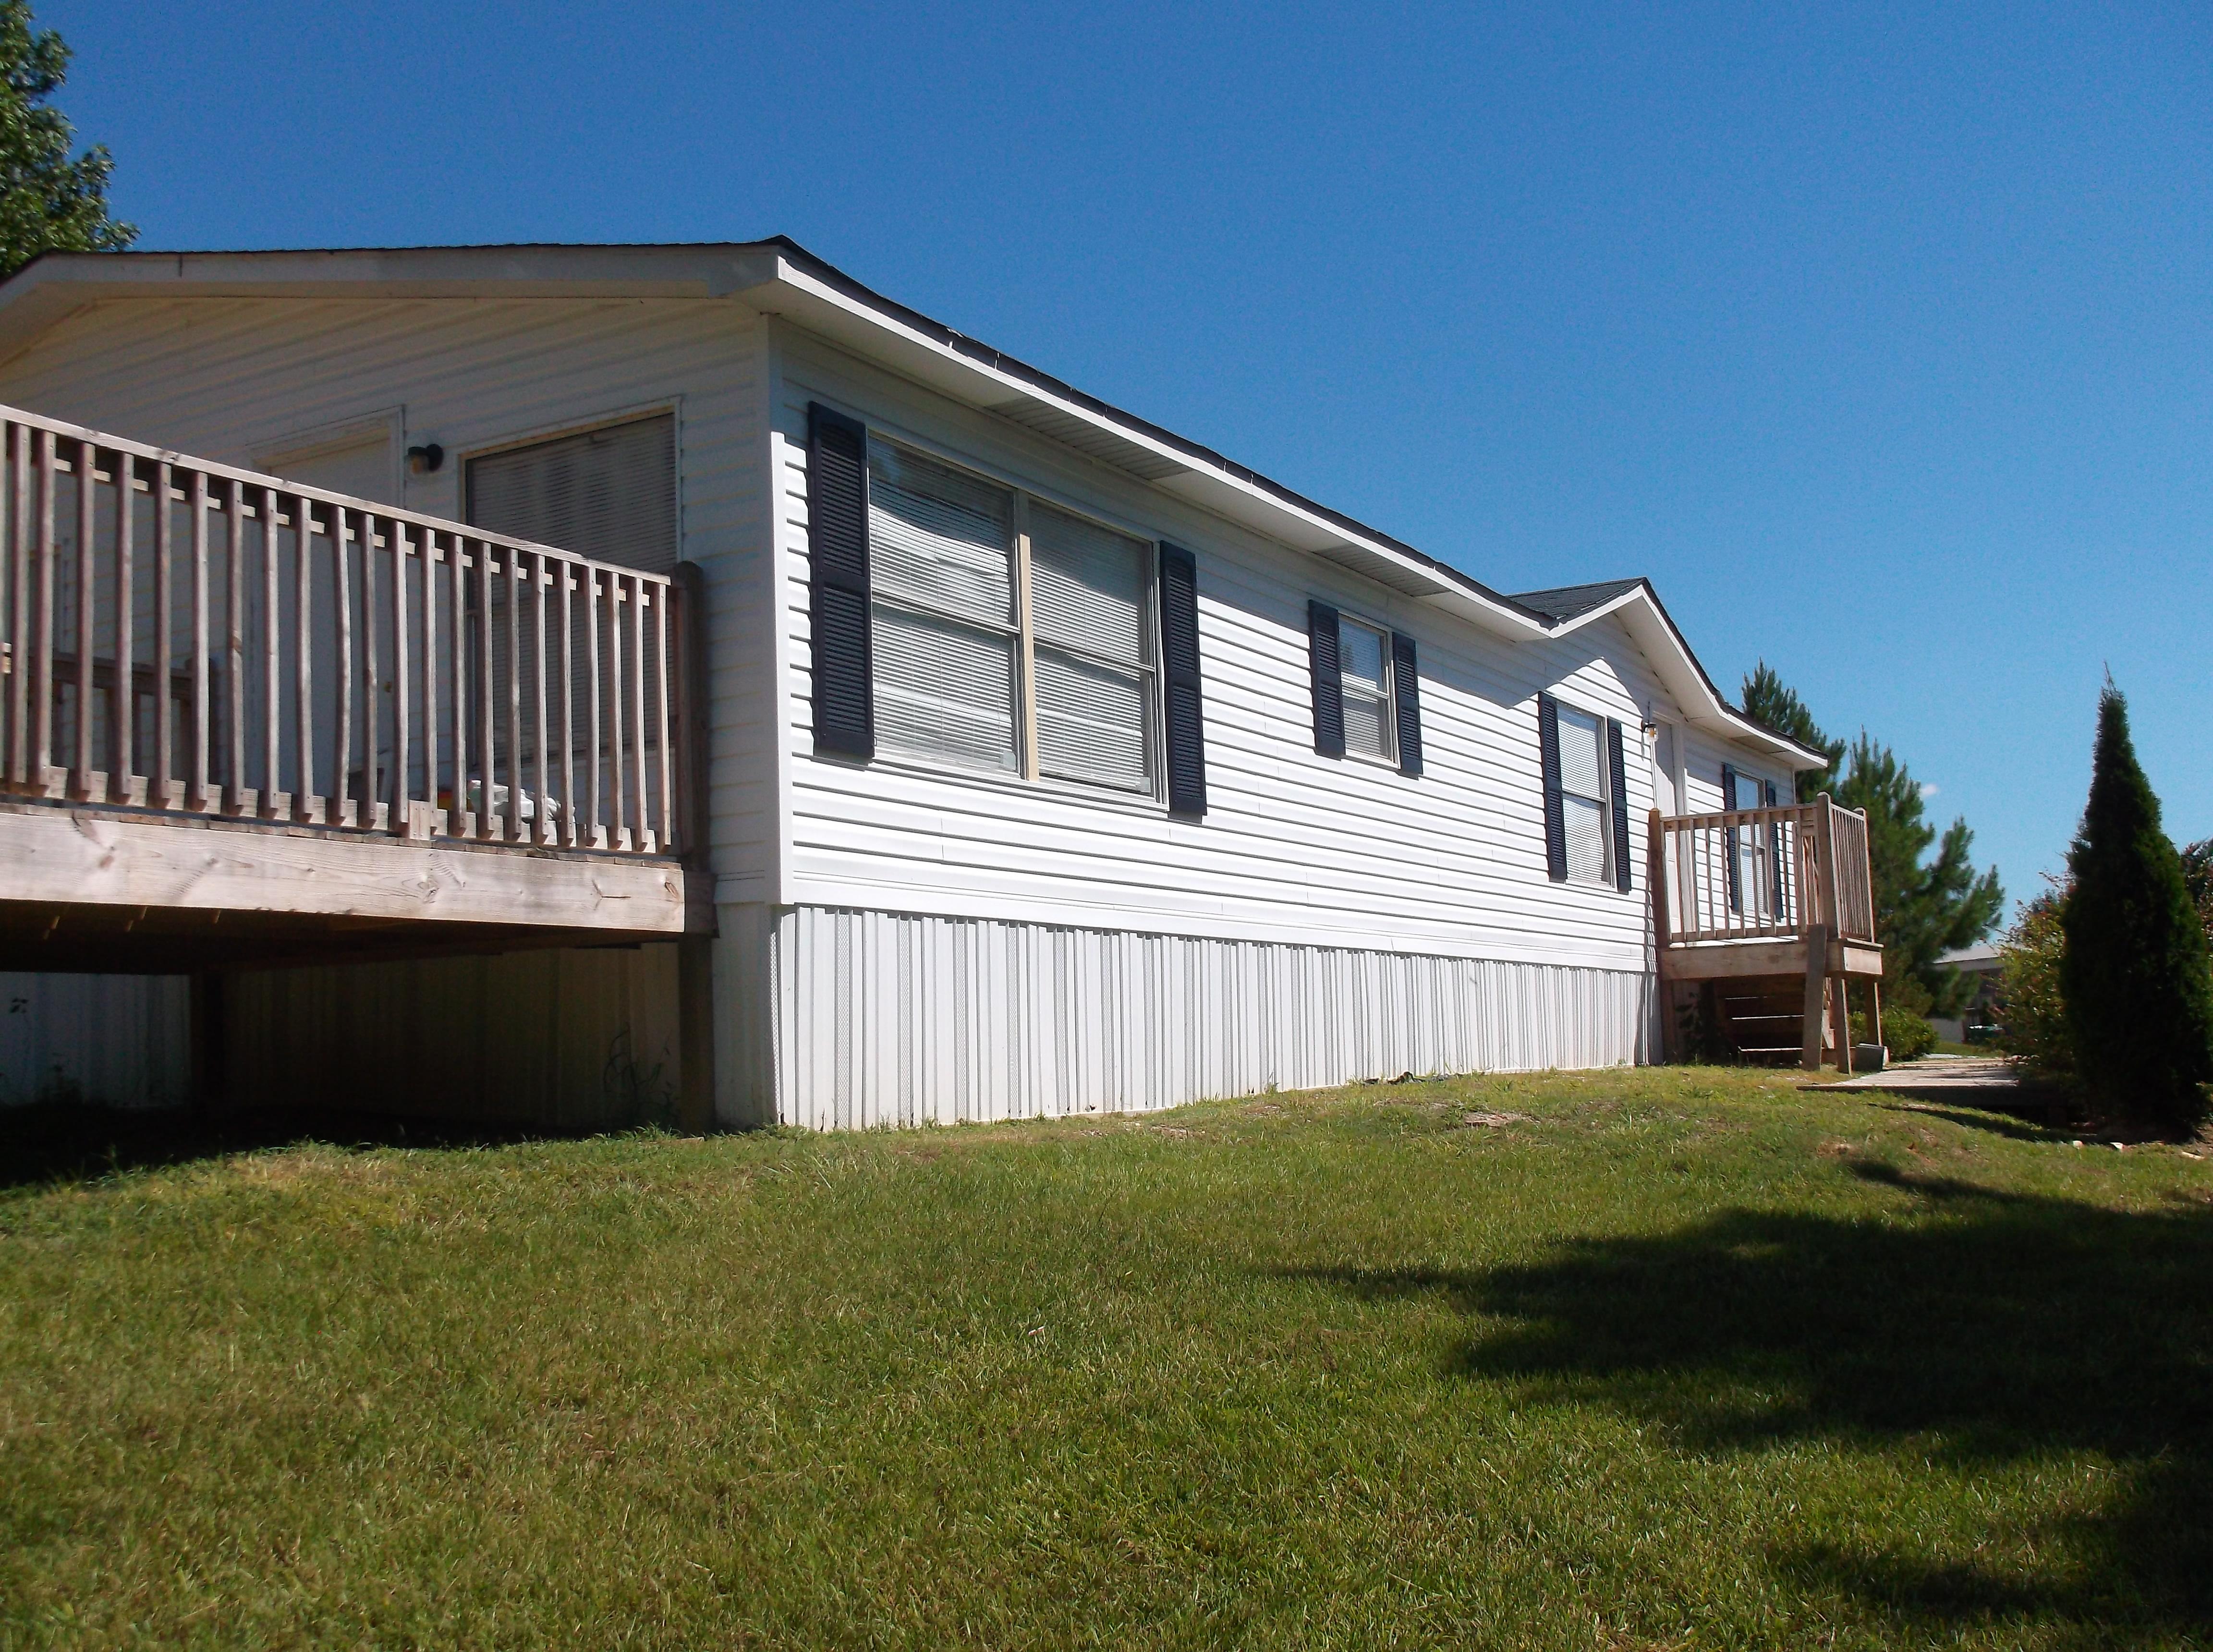 Country Ridge Homes Rental Homes